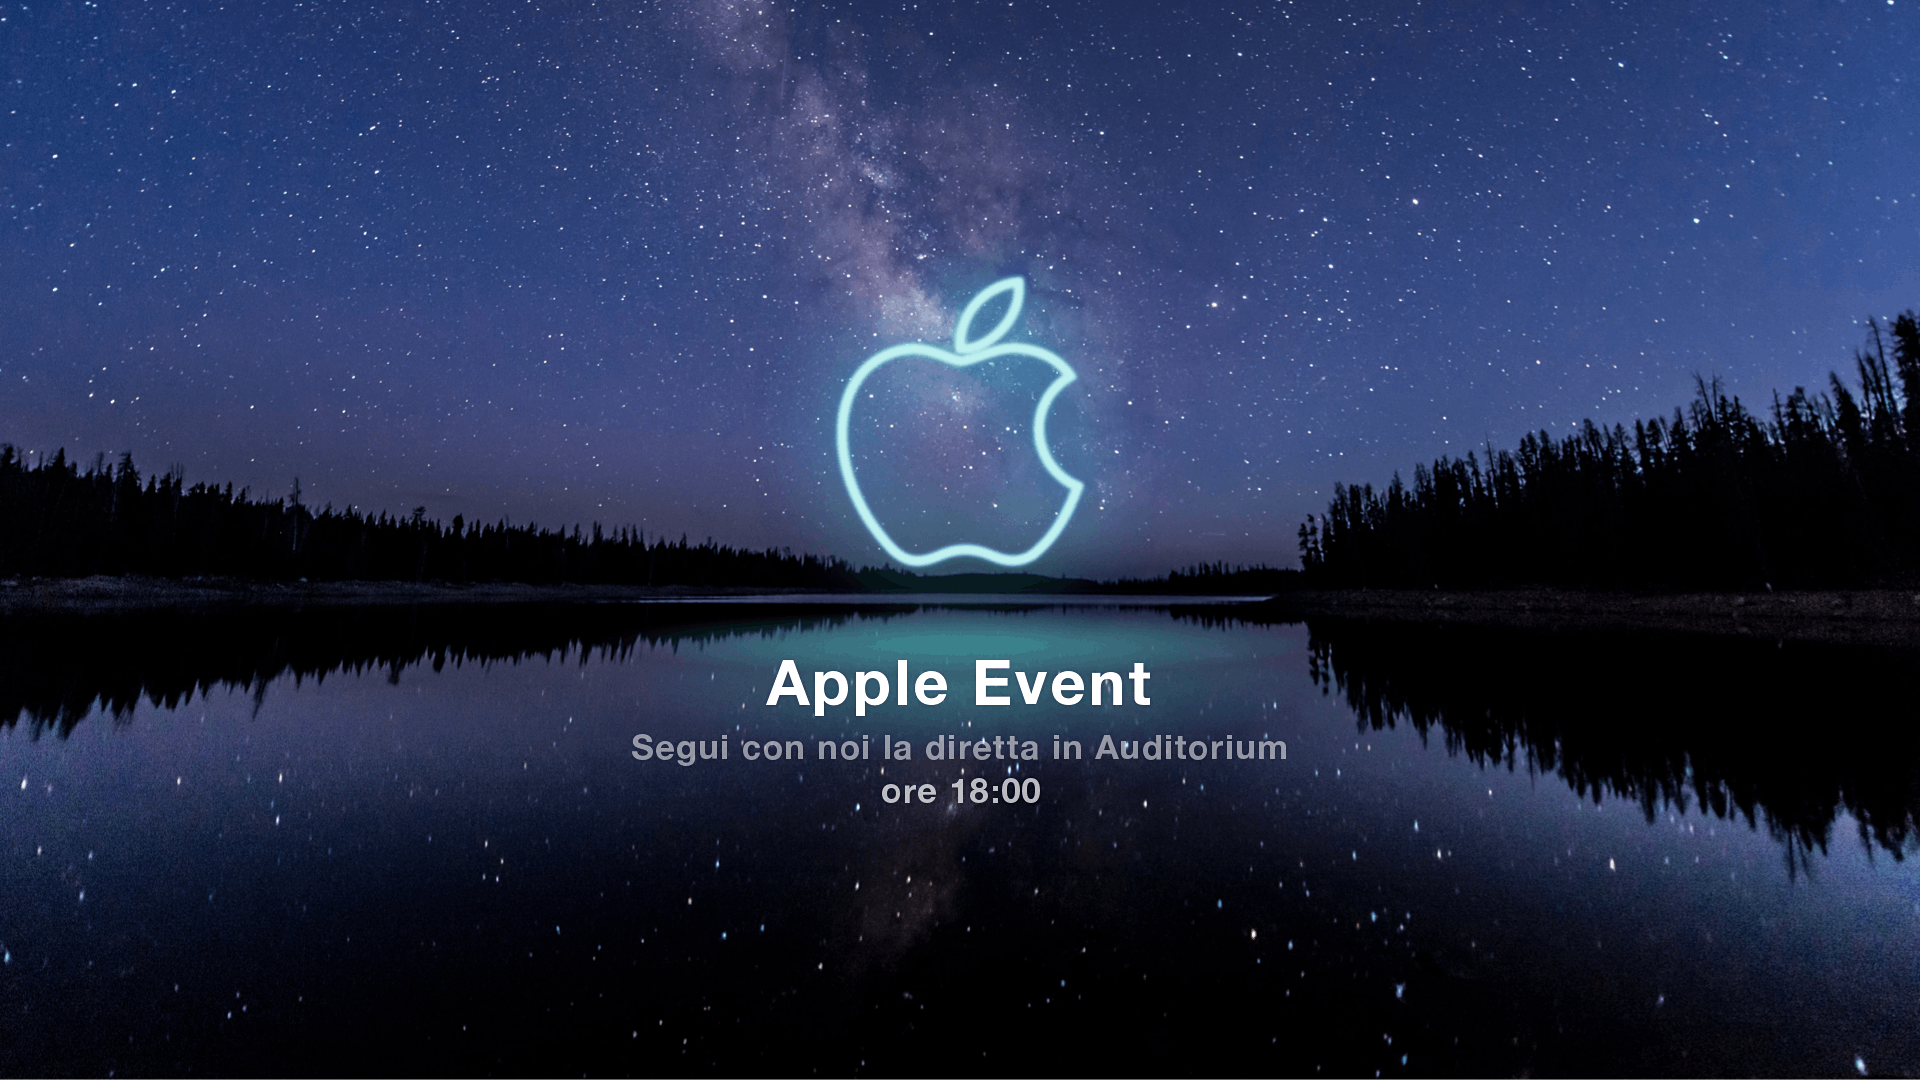 California streaming - Apple event